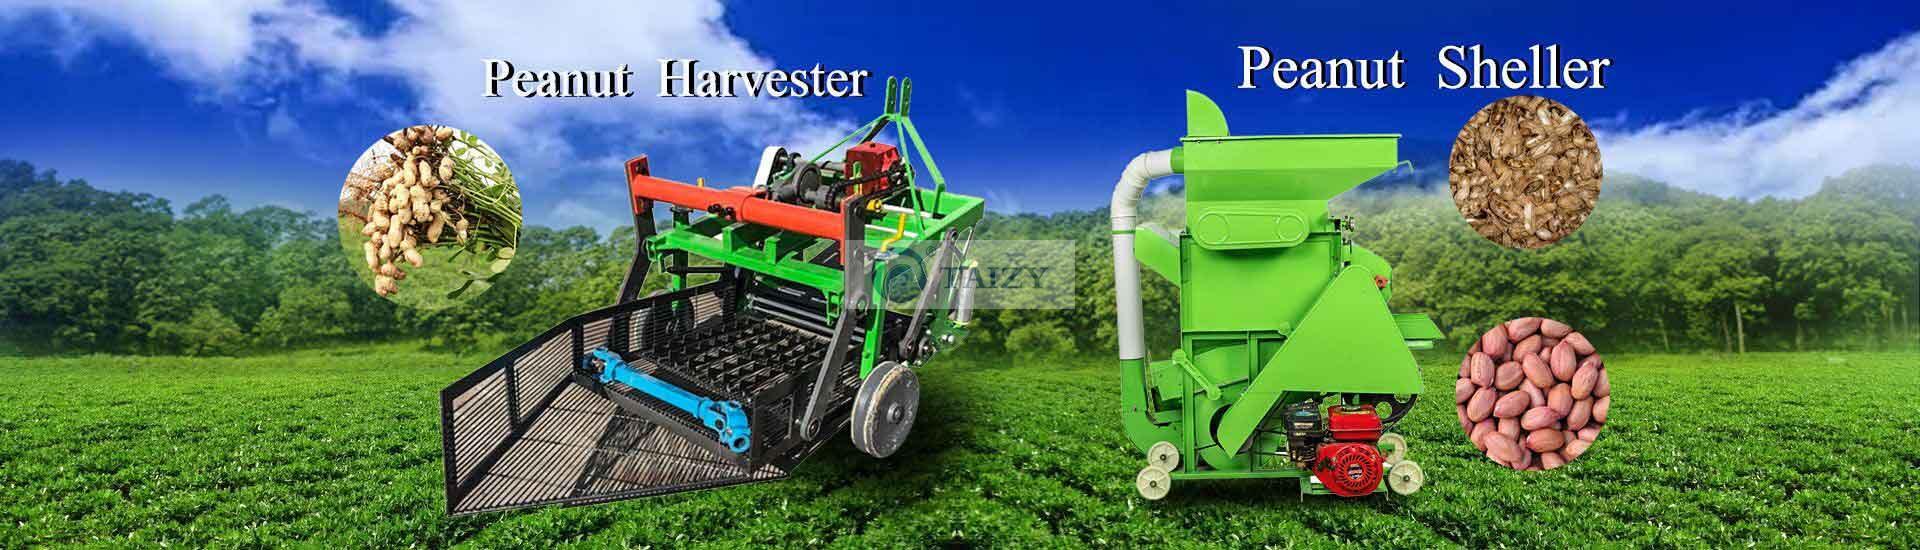 pranut-harvester-1